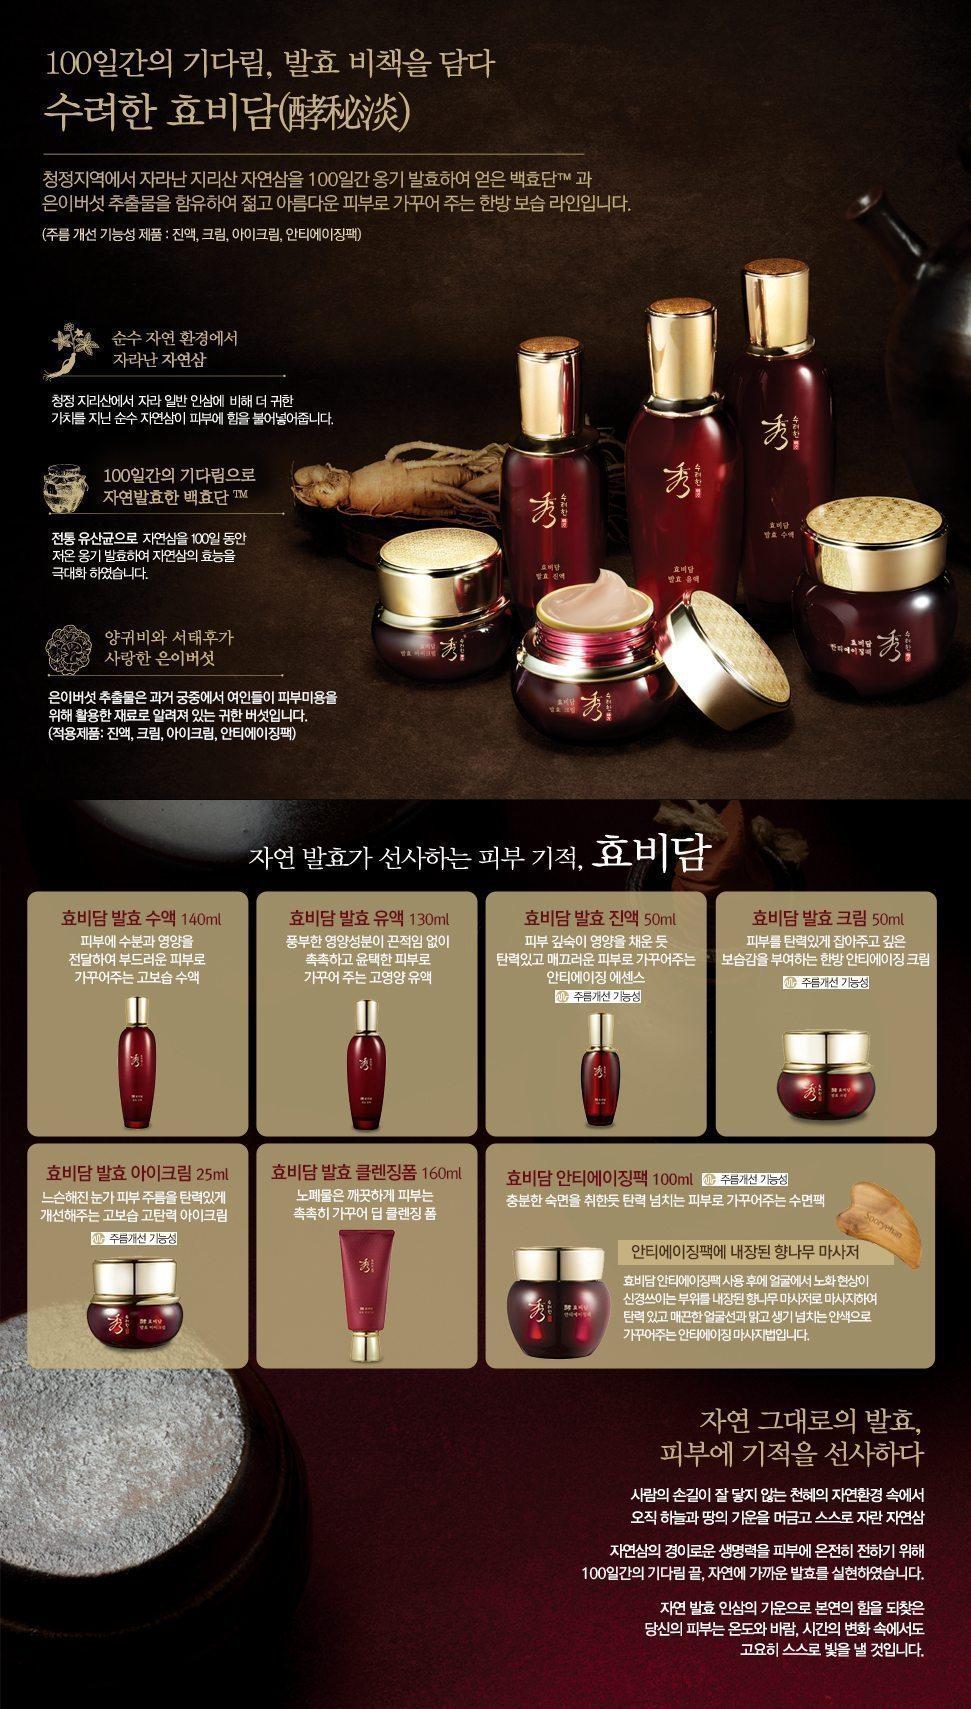 Sooryehan Hyo Bidam Fermented Cream 50ml malaysia singapore indonesia